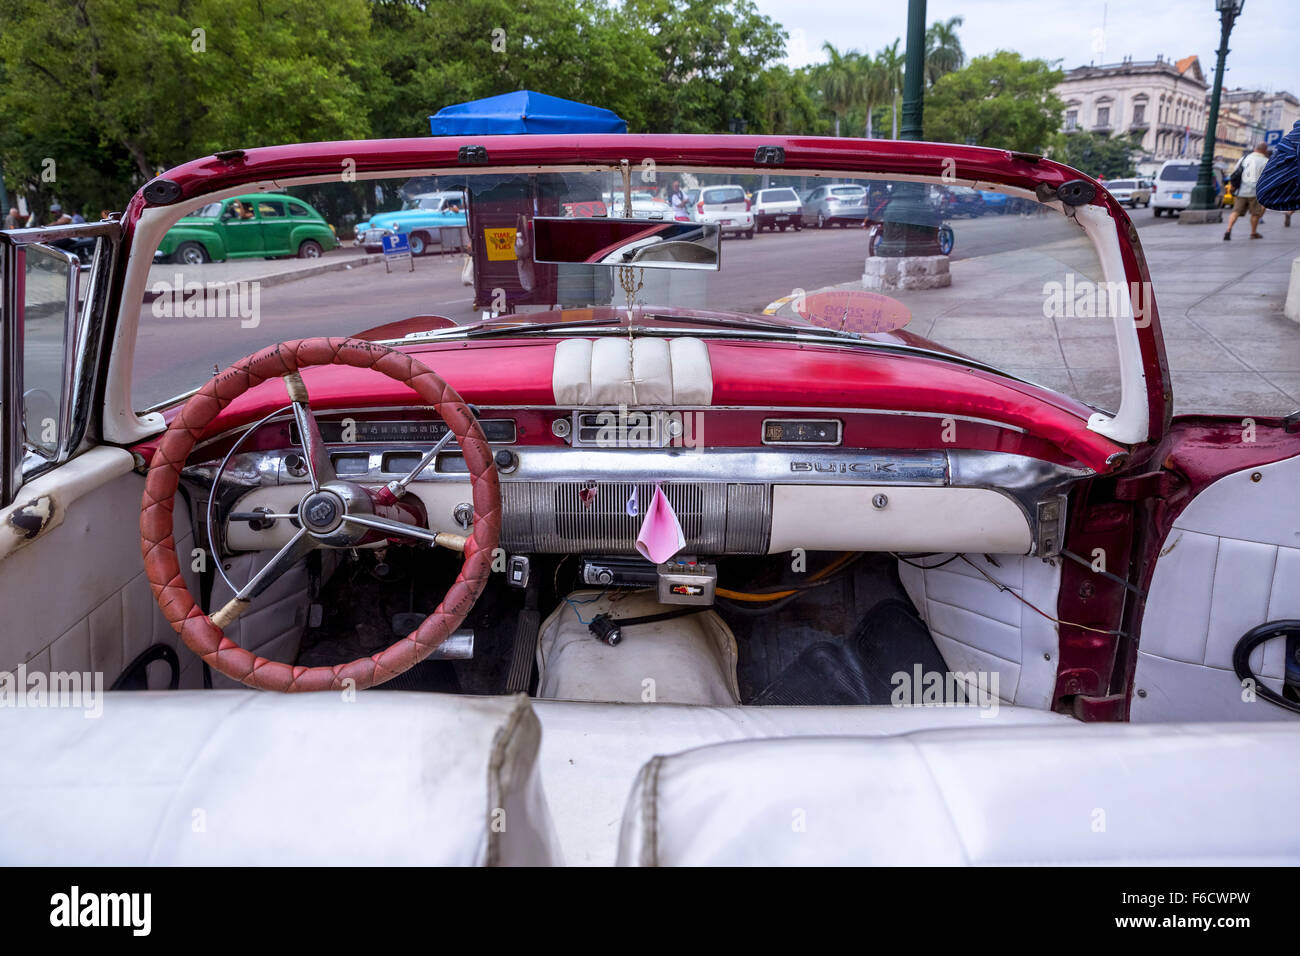 Hebden Bridge Car Show